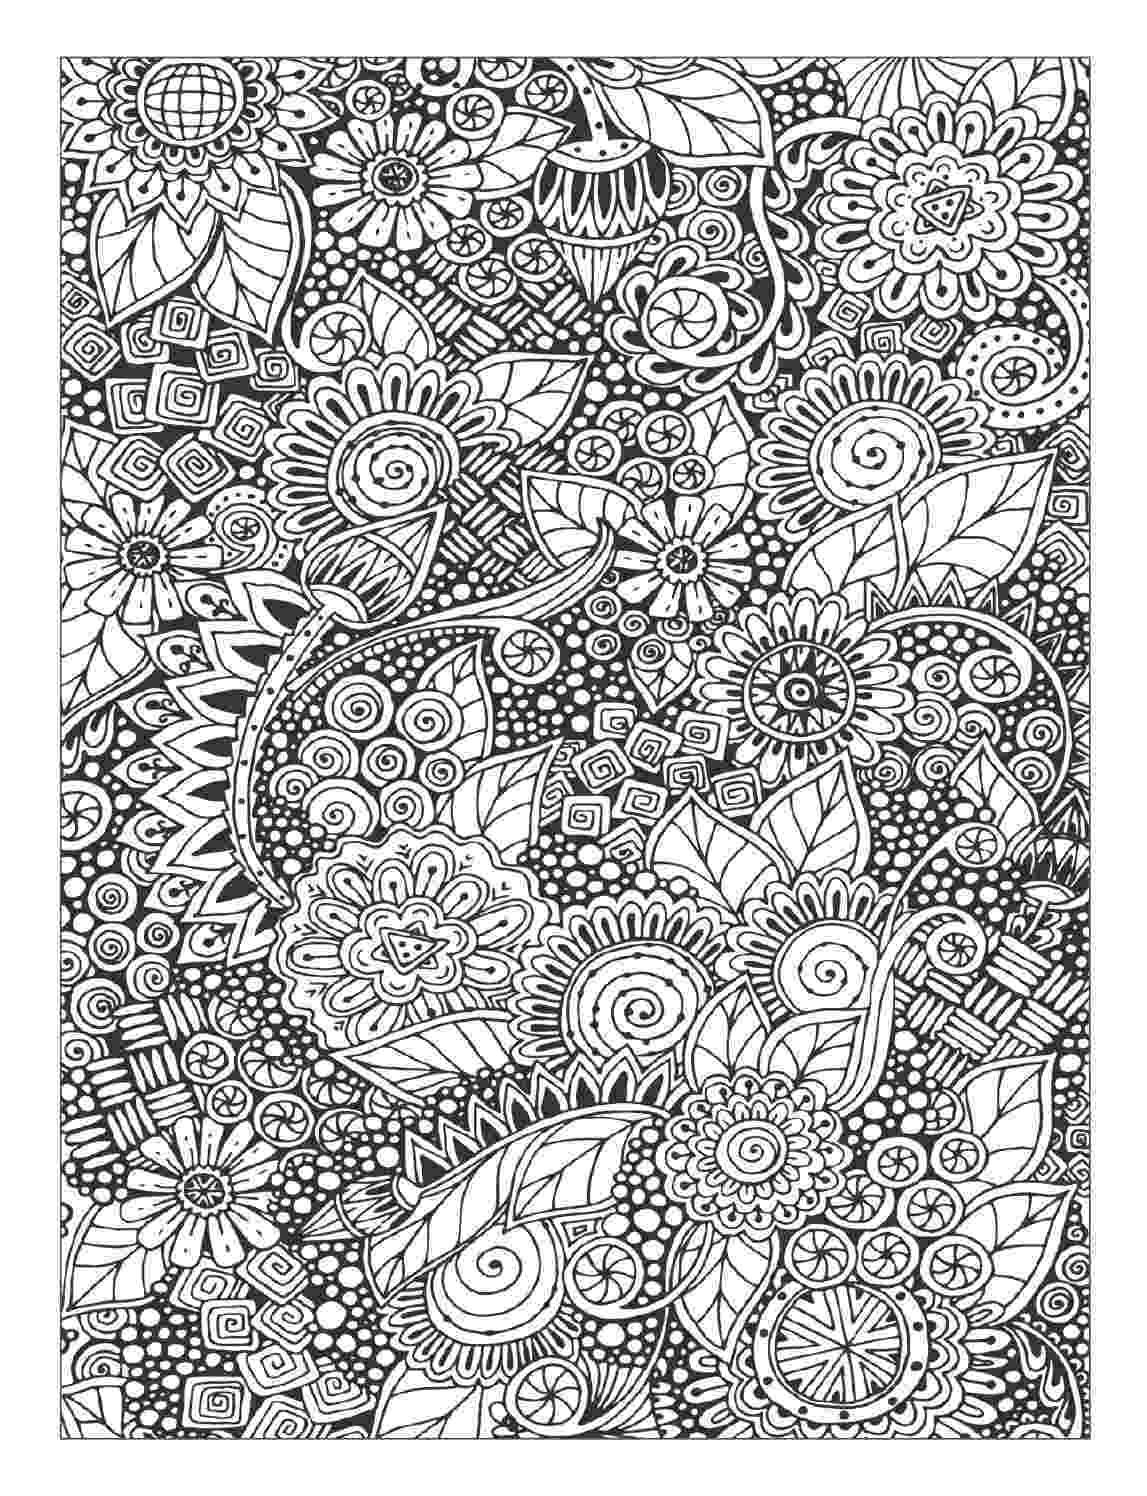 floral designs coloring book floral coloring pages for adults best coloring pages for designs book floral coloring